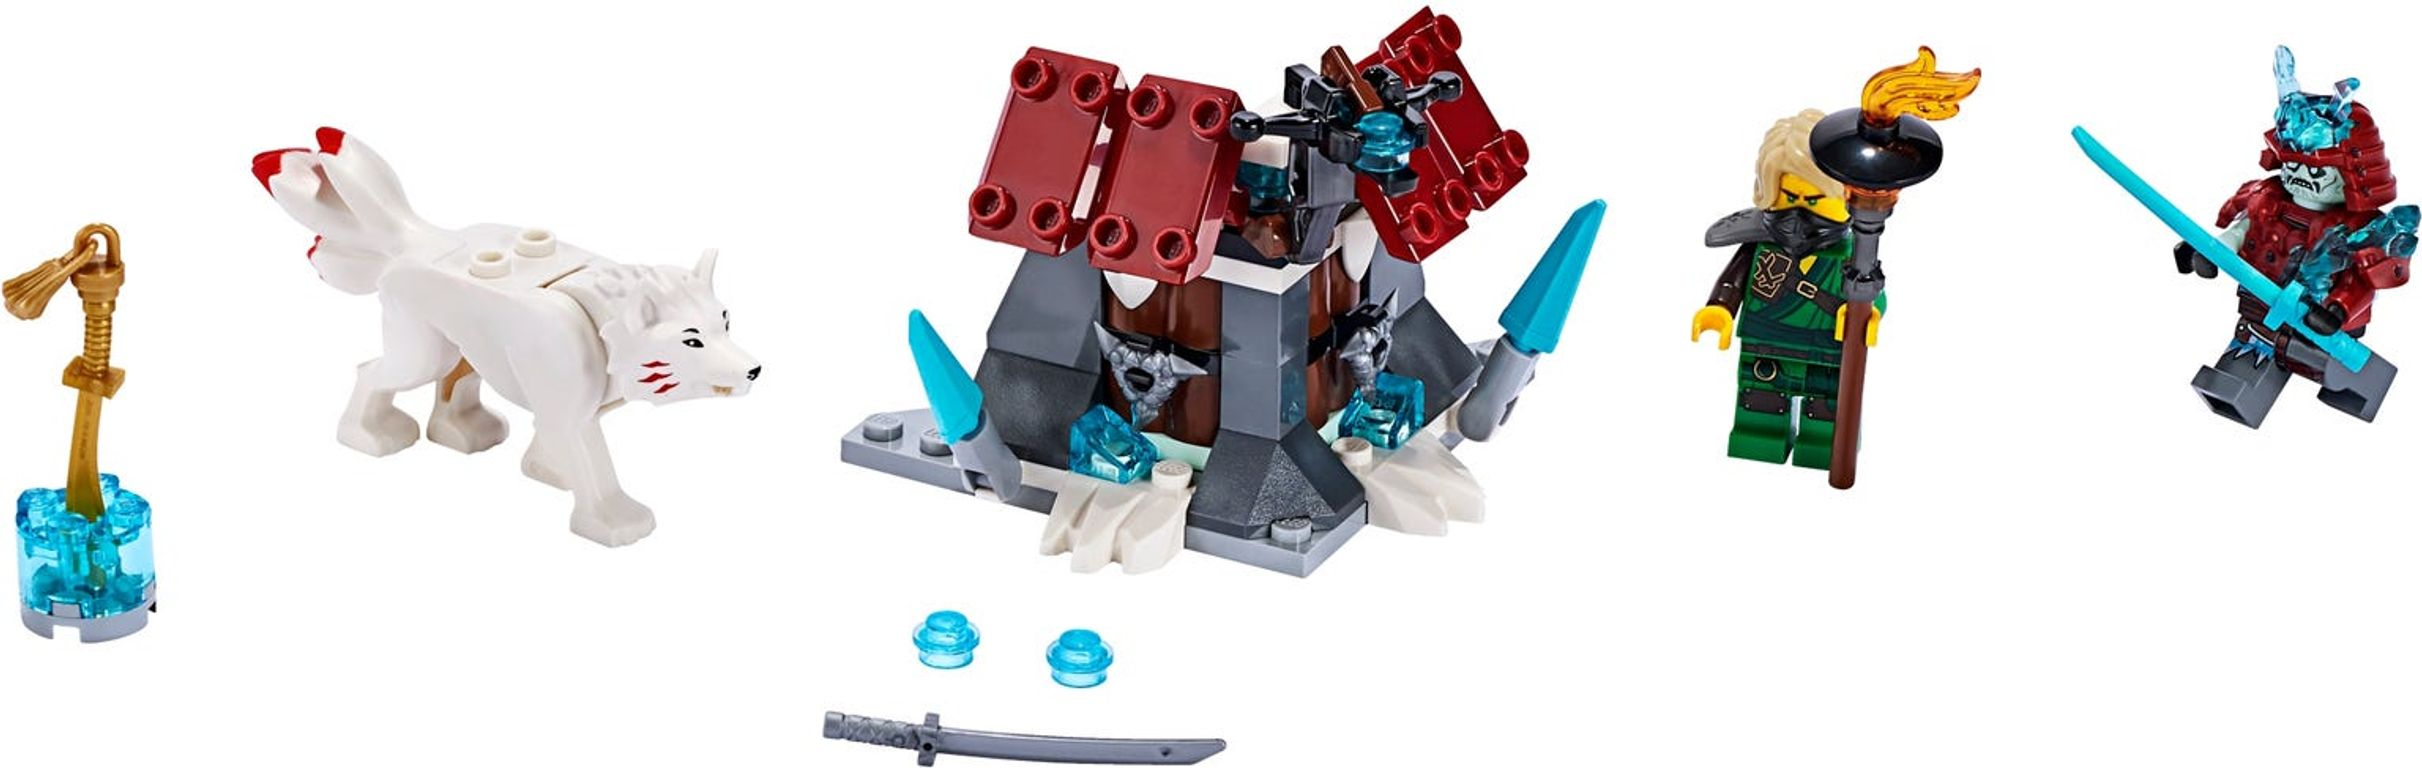 LEGO® Ninjago Lloyd's Journey components